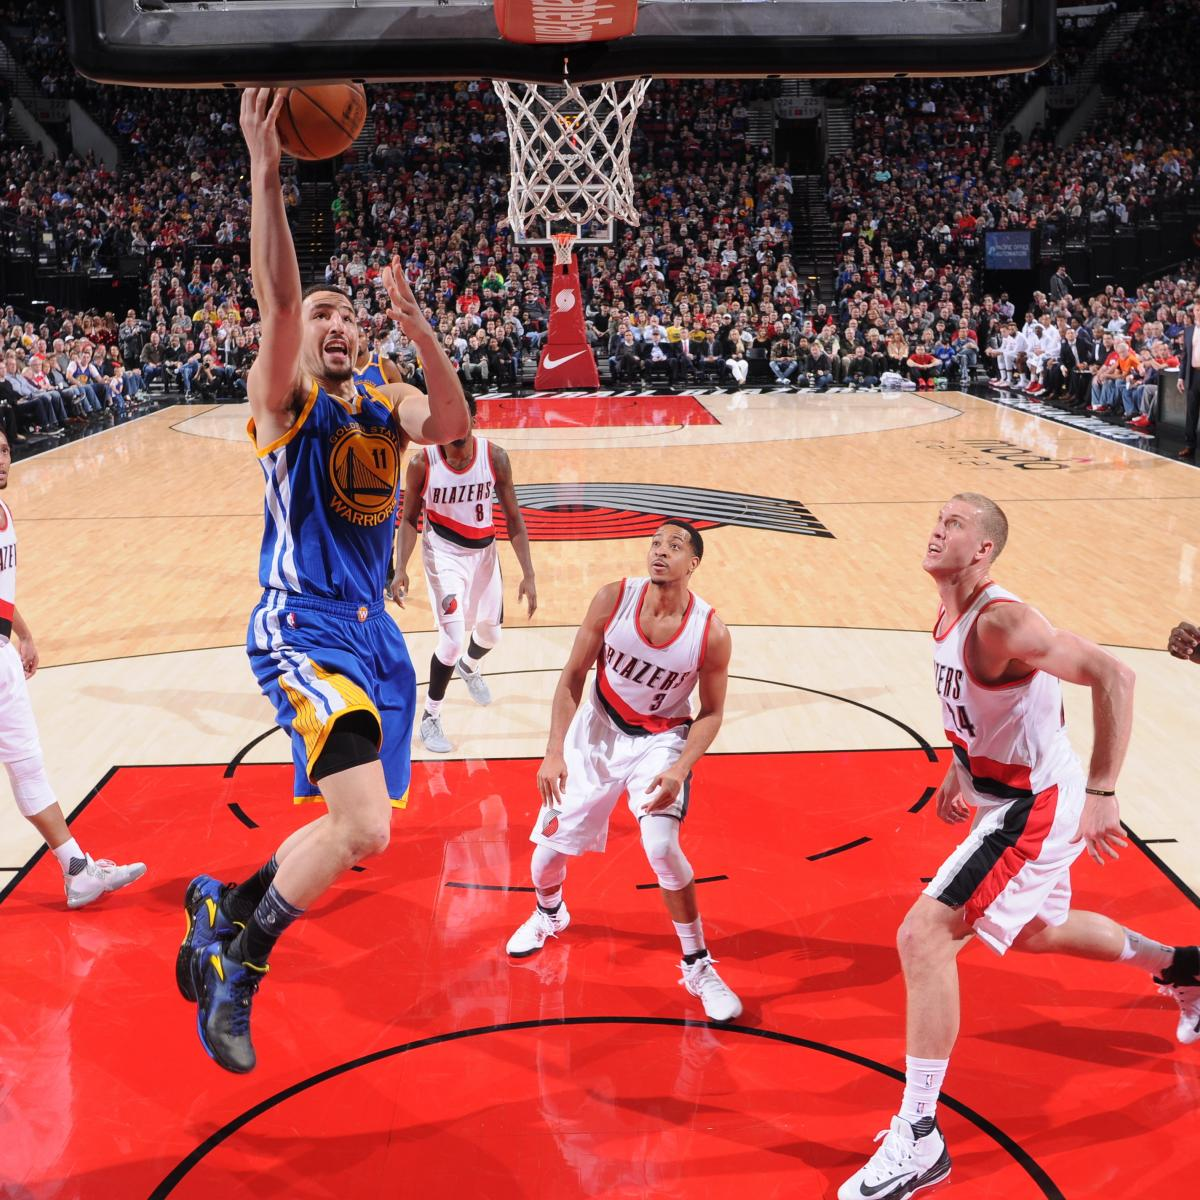 Portland Trail Blazers Final Score: Warriors Vs. Trail Blazers: Score, Highlights, Reaction